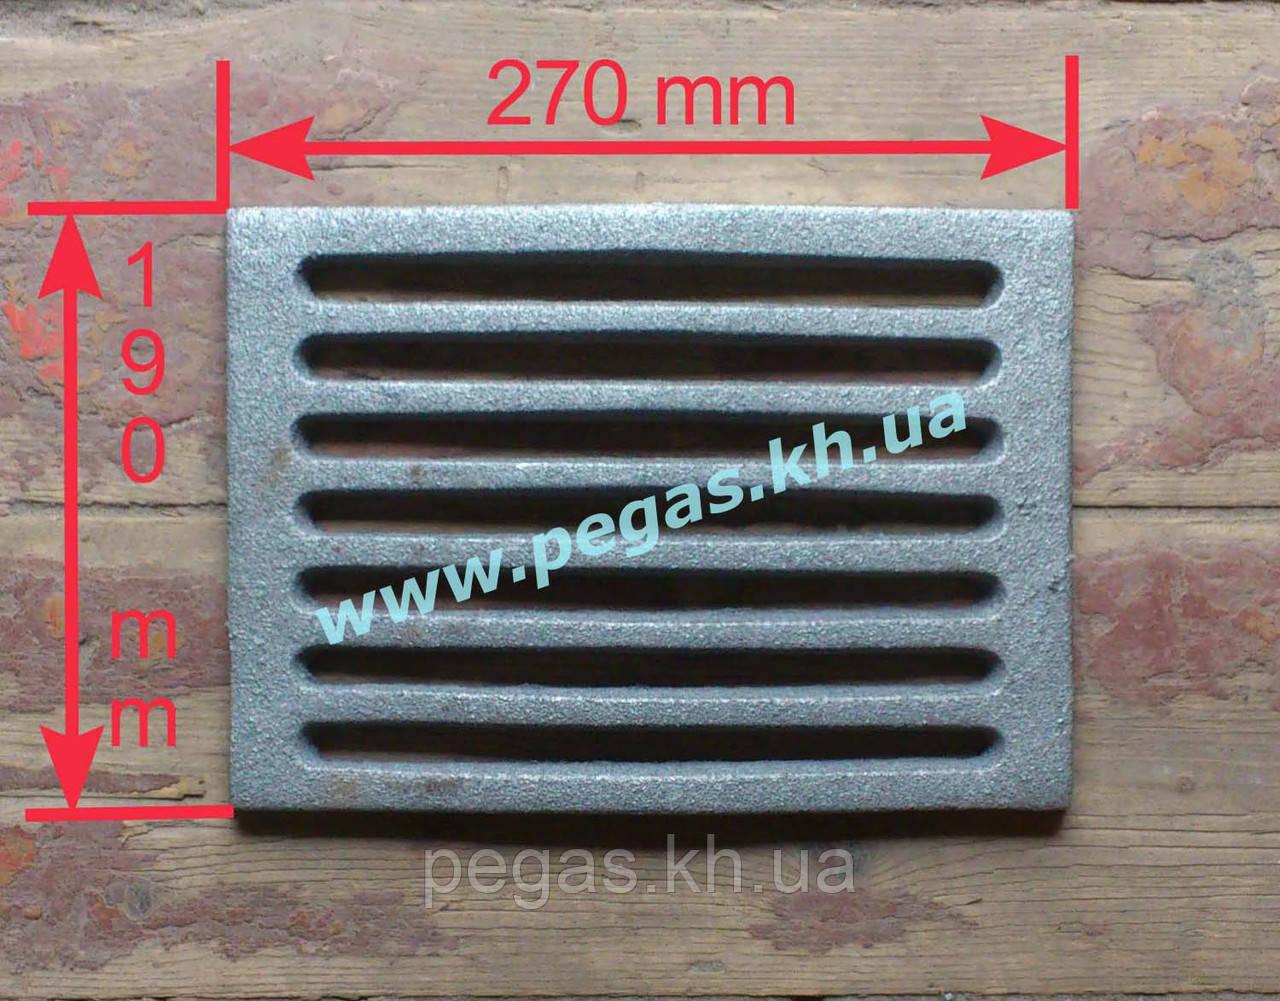 Колосник чугунное литье (190х270 мм) грубу, печи, барбекю, мангал